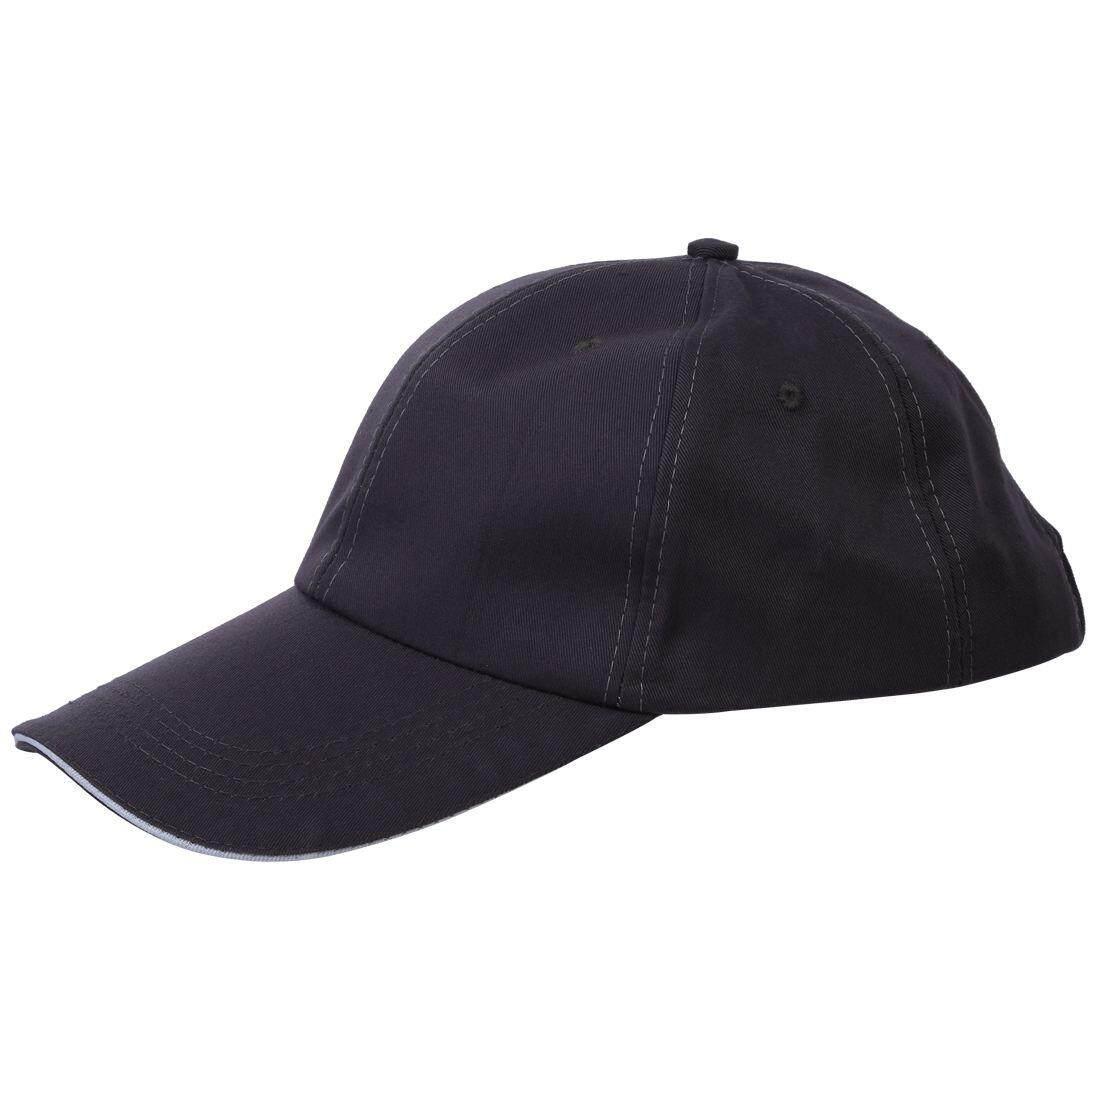 118c00a8c9bd48 Latest OEM Hats & Caps Products | Enjoy Huge Discounts | Lazada SG